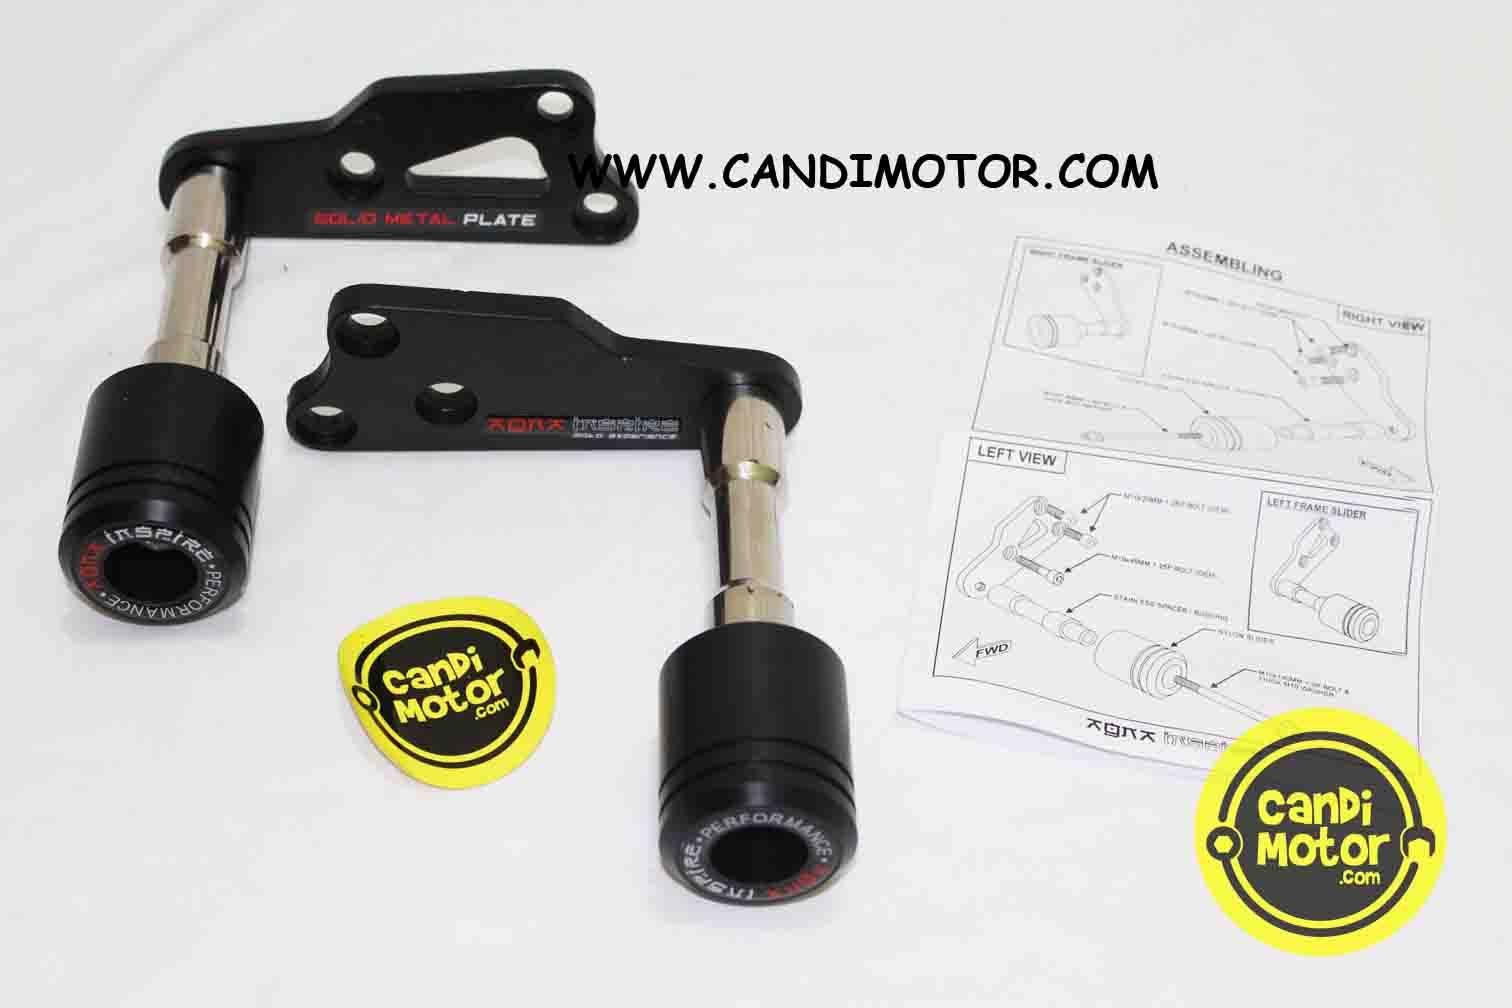 Frame Slider Pelindung Fairing Yamaha R25 Mt25 R3 Candi Motor1 Prospeed Black Series Mt 25 Slip On